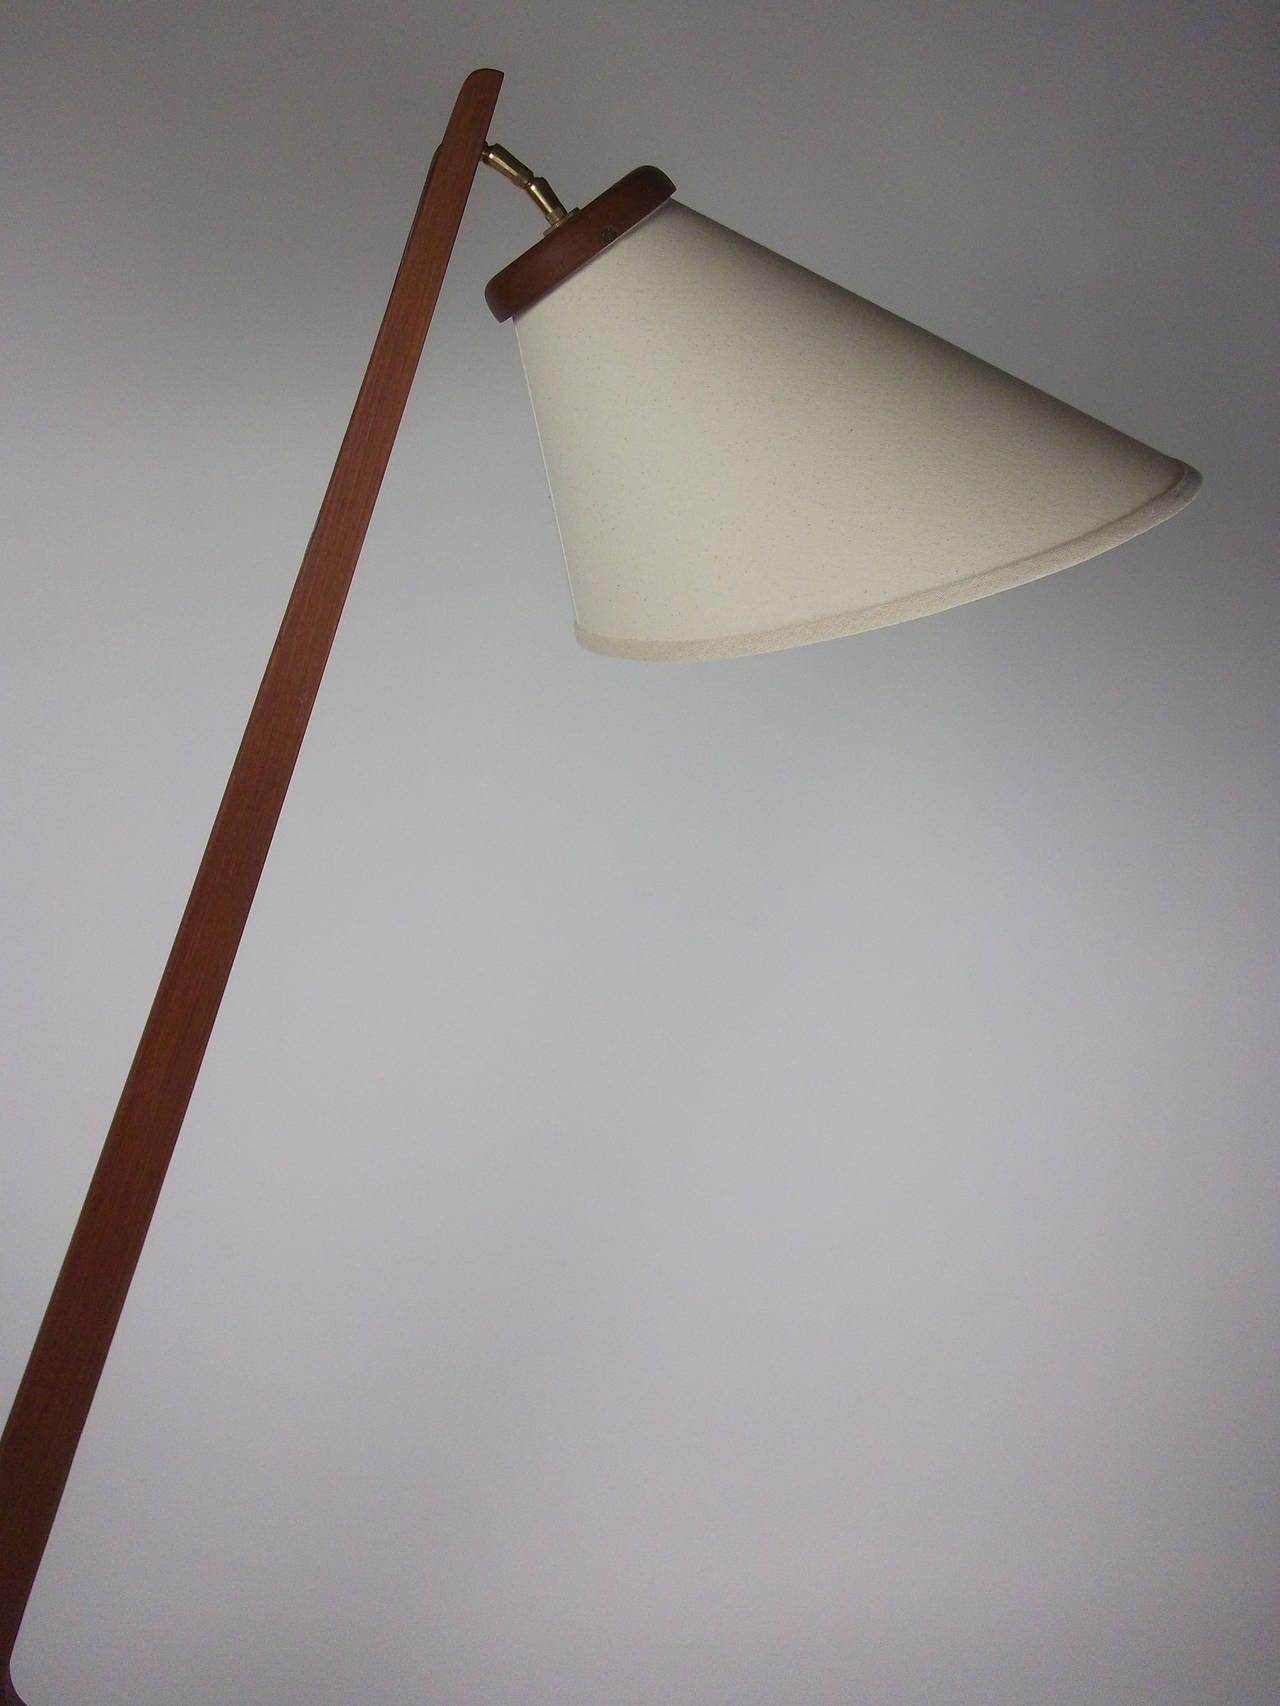 striking 1960s danish modern three leg teak floor lamp at 1stdibs. Black Bedroom Furniture Sets. Home Design Ideas